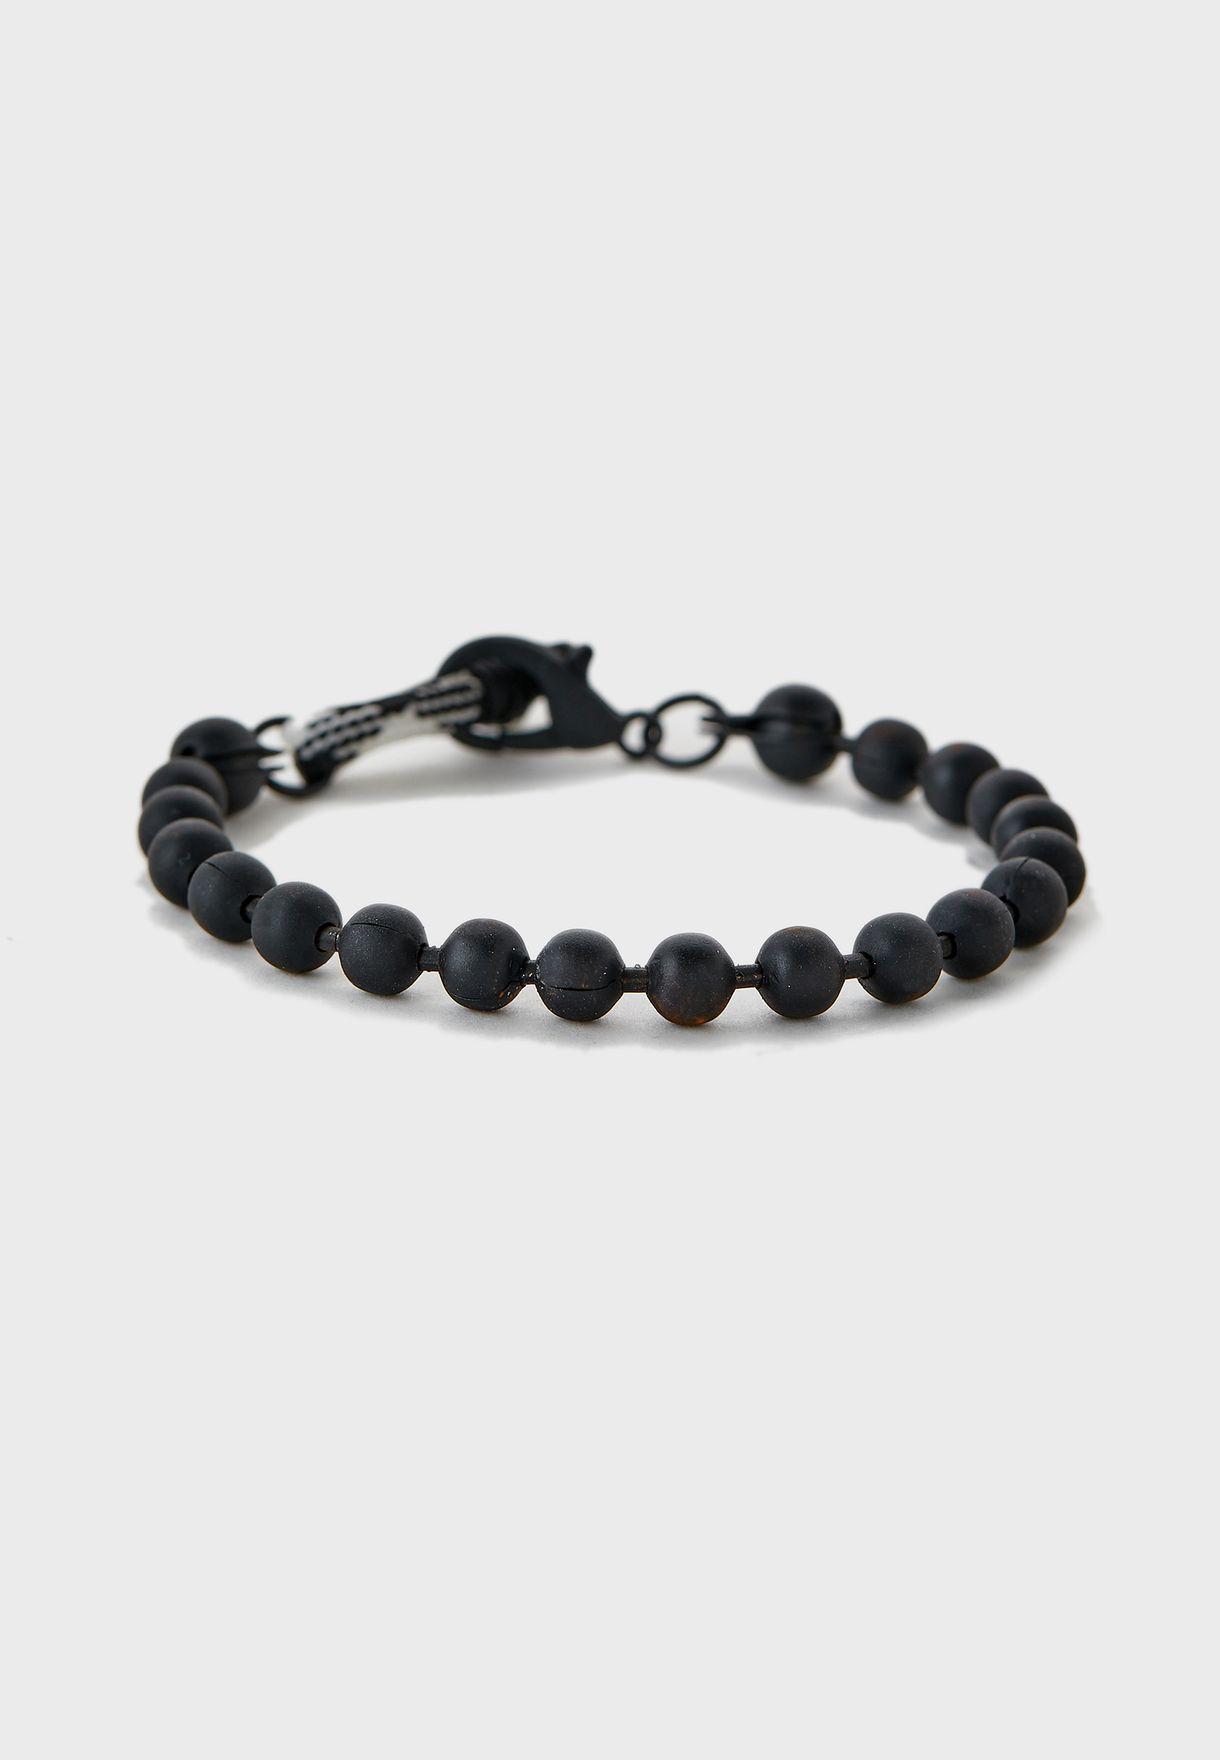 Ball Chain Cord Loop Bracelet